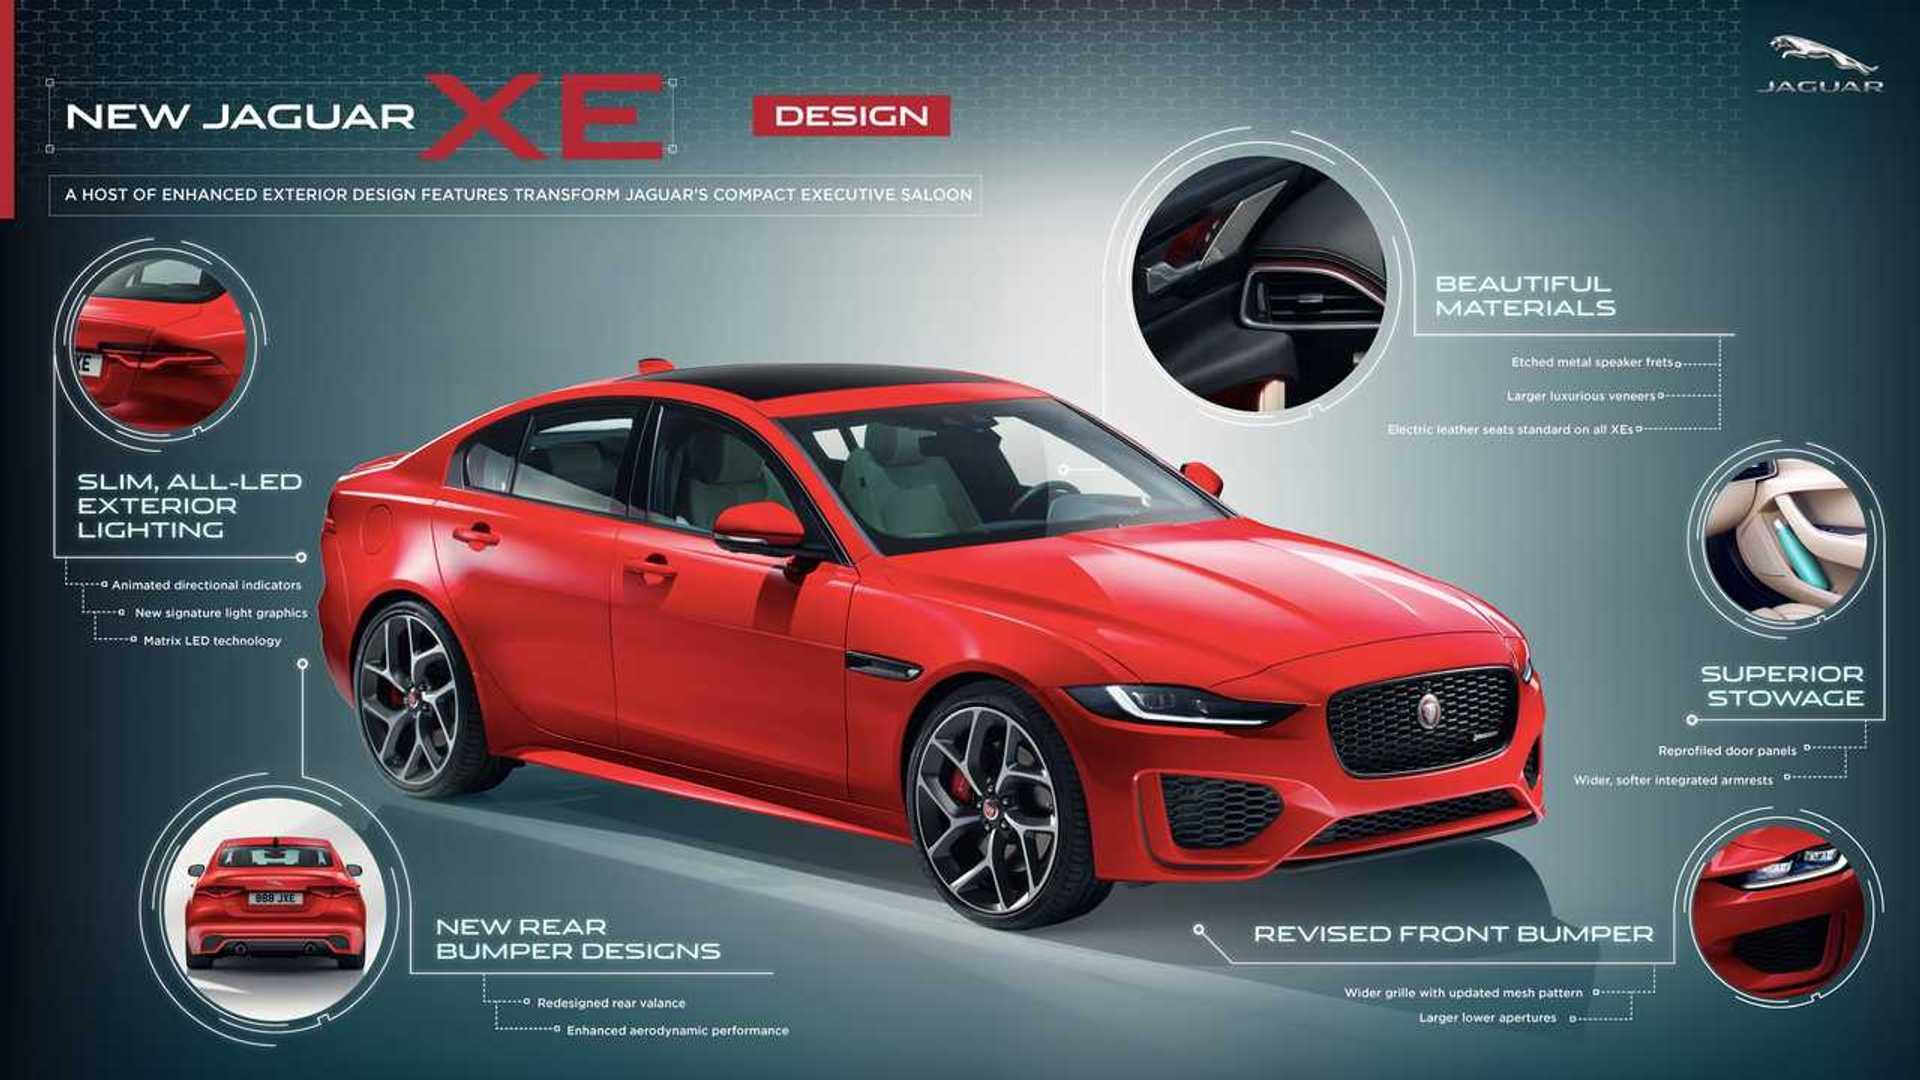 2020-jaguar-xe.jpg